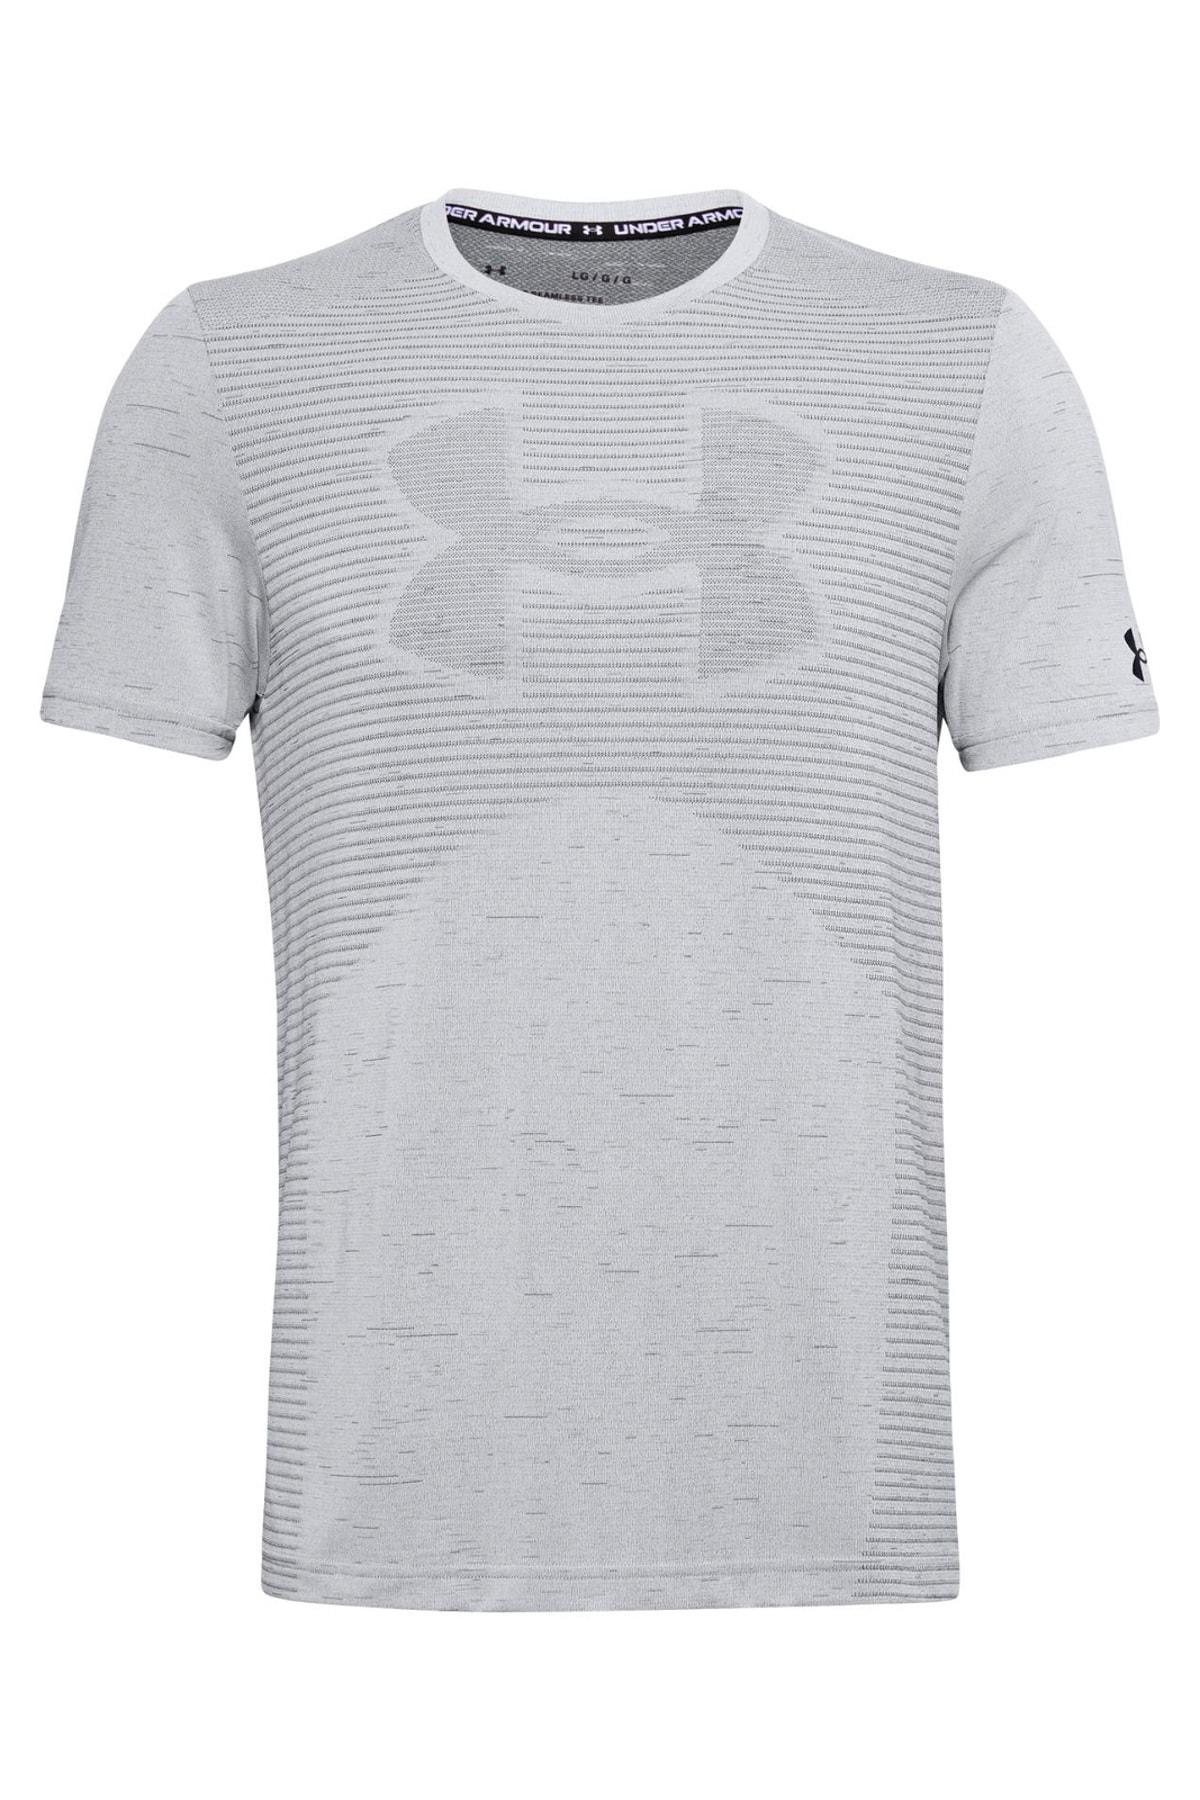 Under Armour Erkek Spor T-Shirt - Ua Seamless Logo Ss - 1356798-014 1